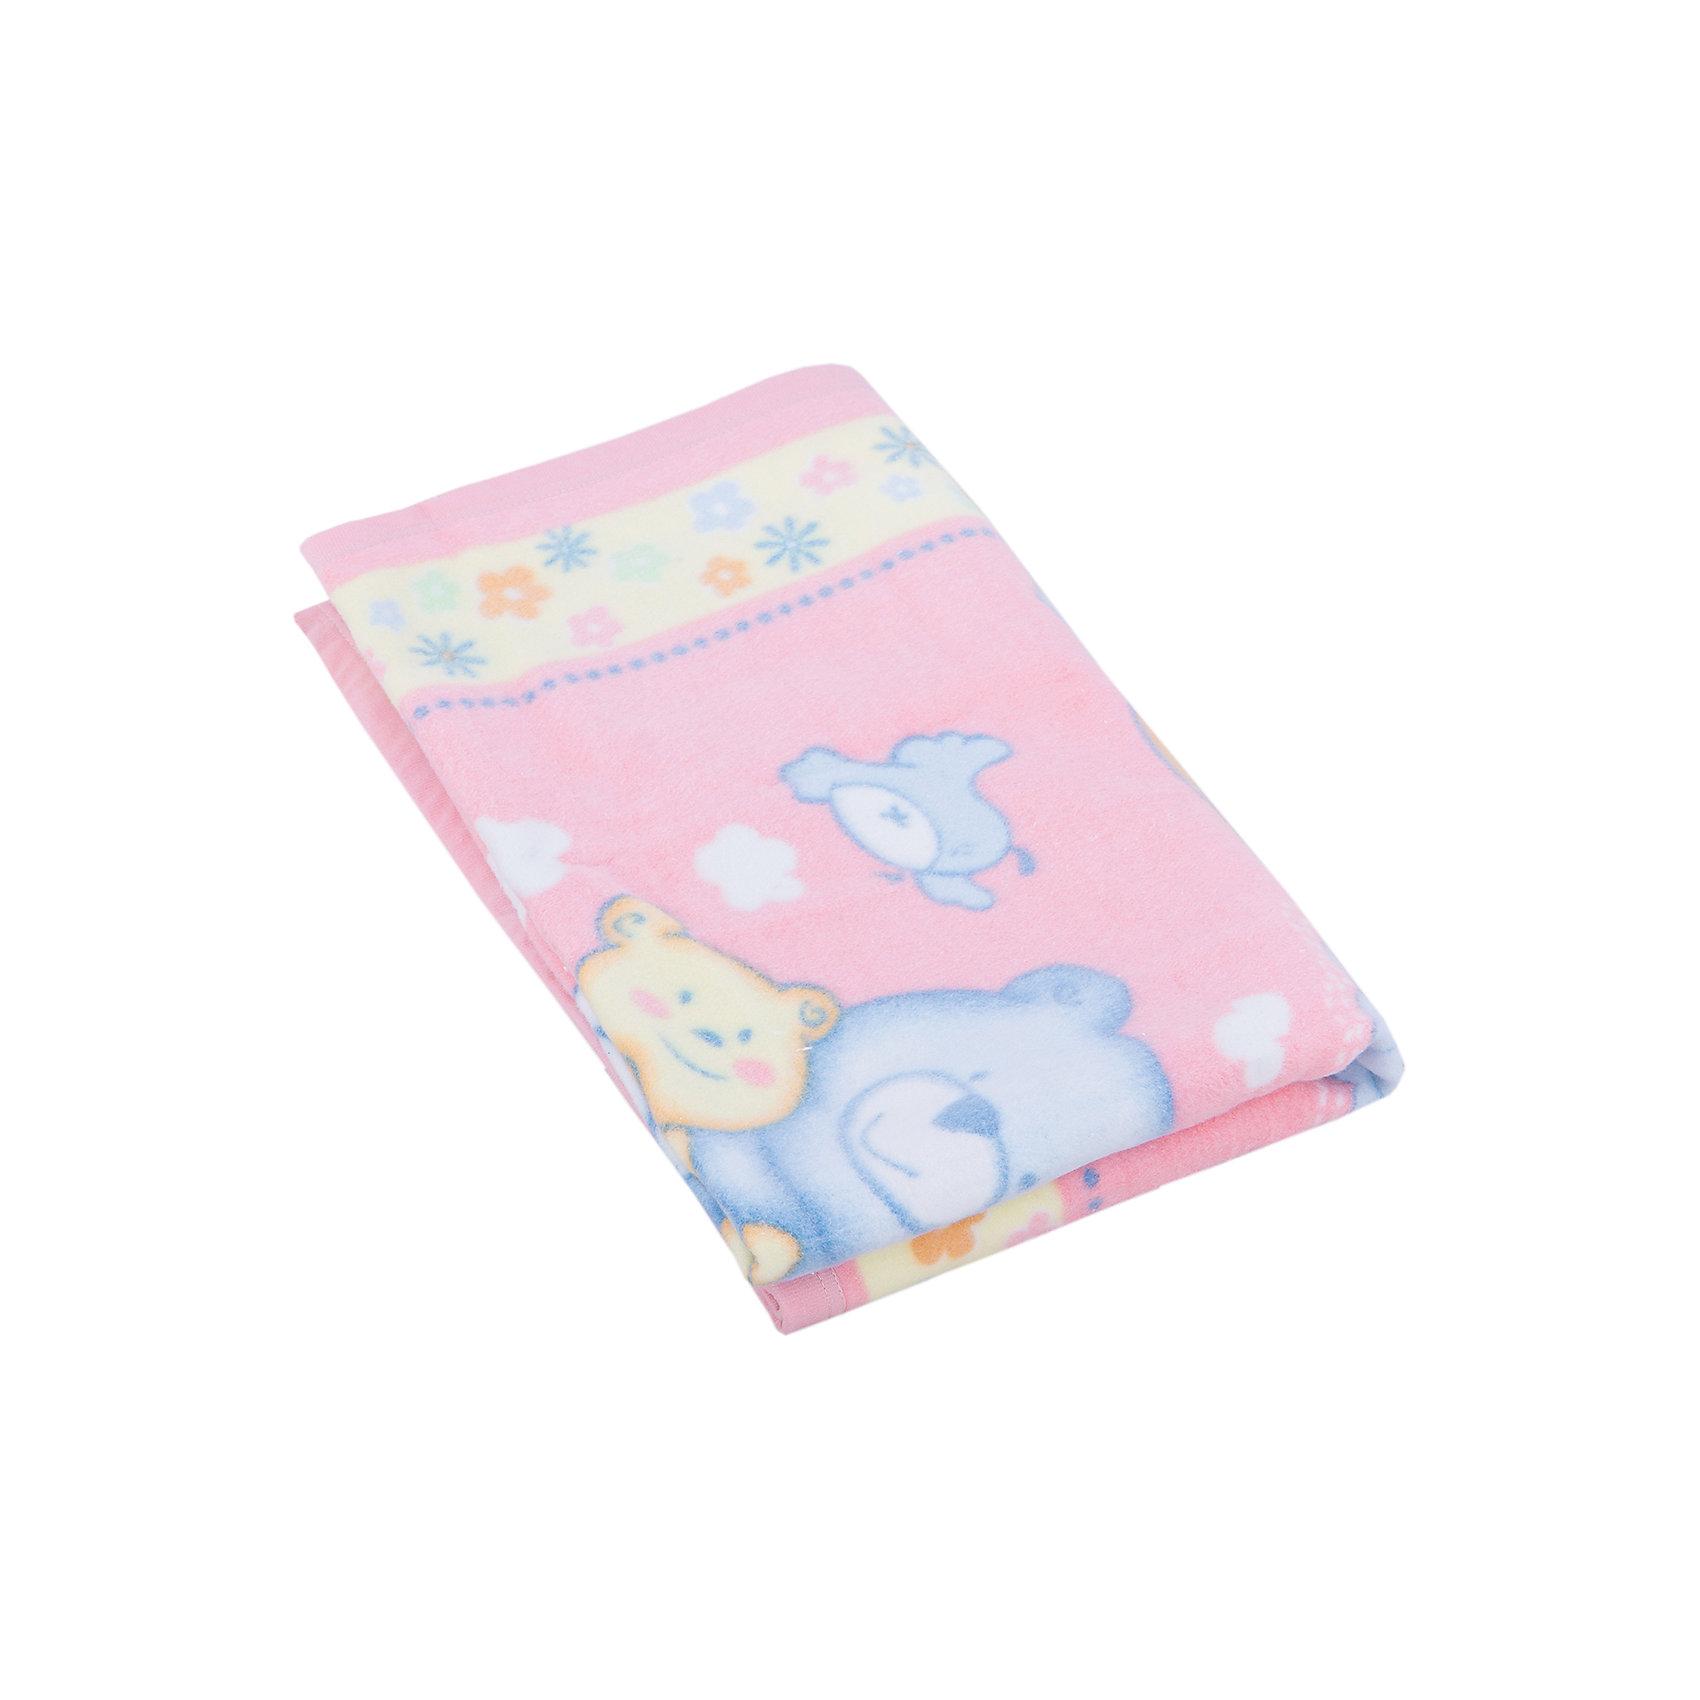 яло байковое Мишка на лужайке, 100х118 2-сторон., Baby Nice, розовый